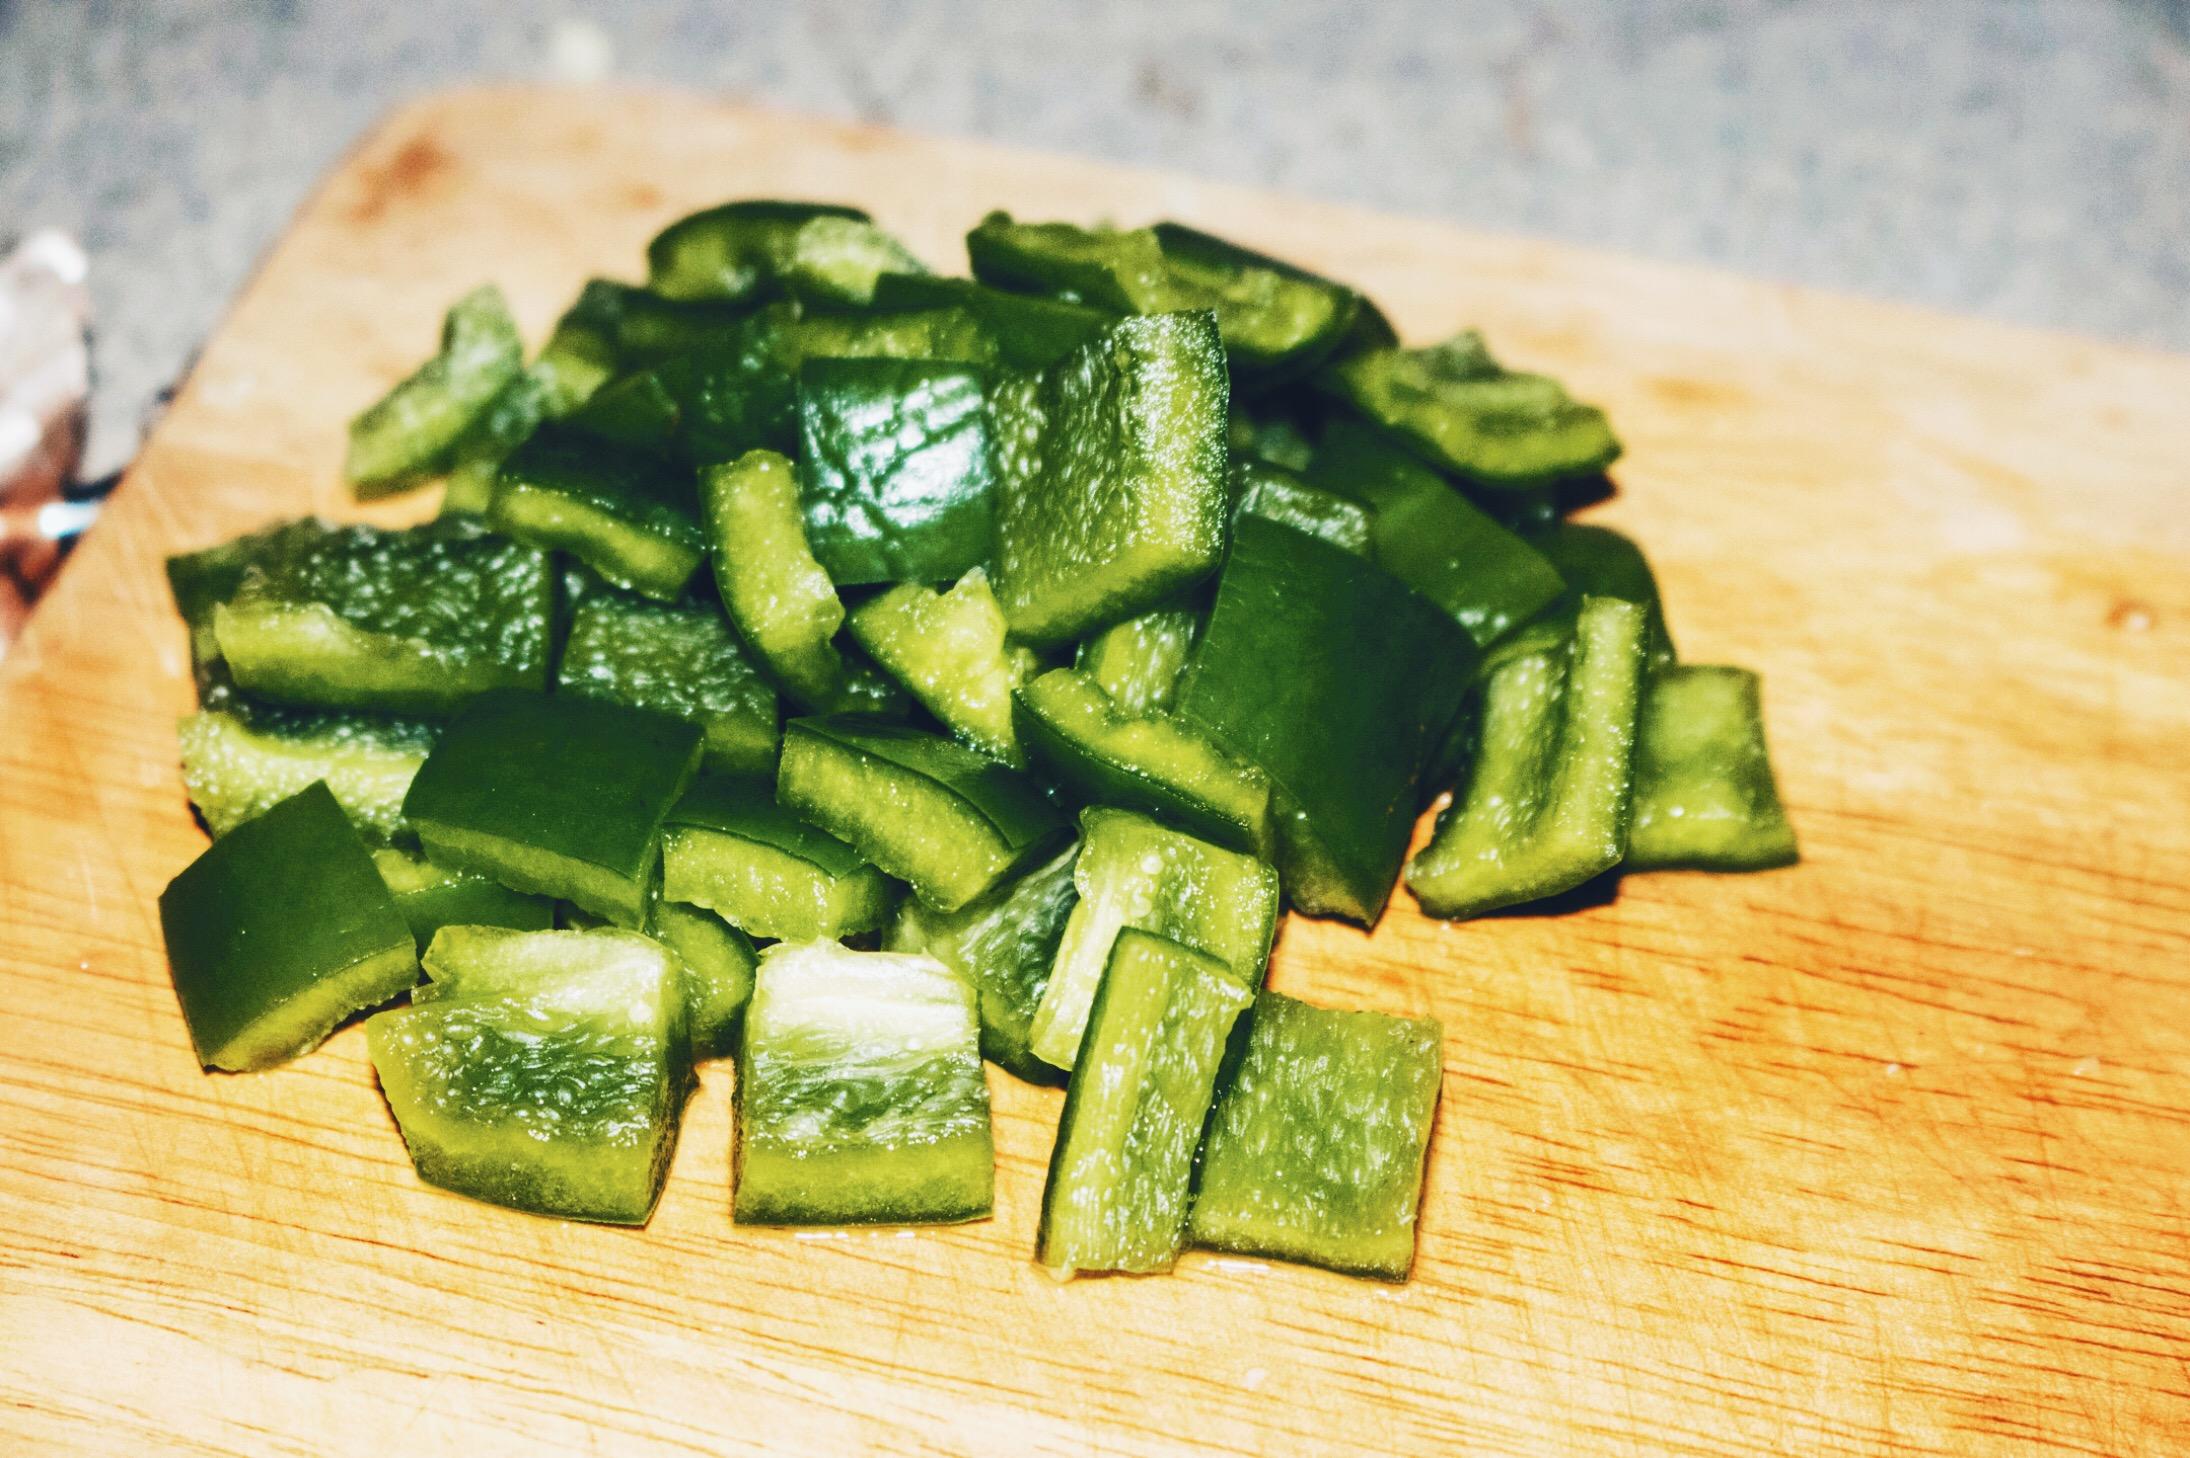 green peppers.jpeg